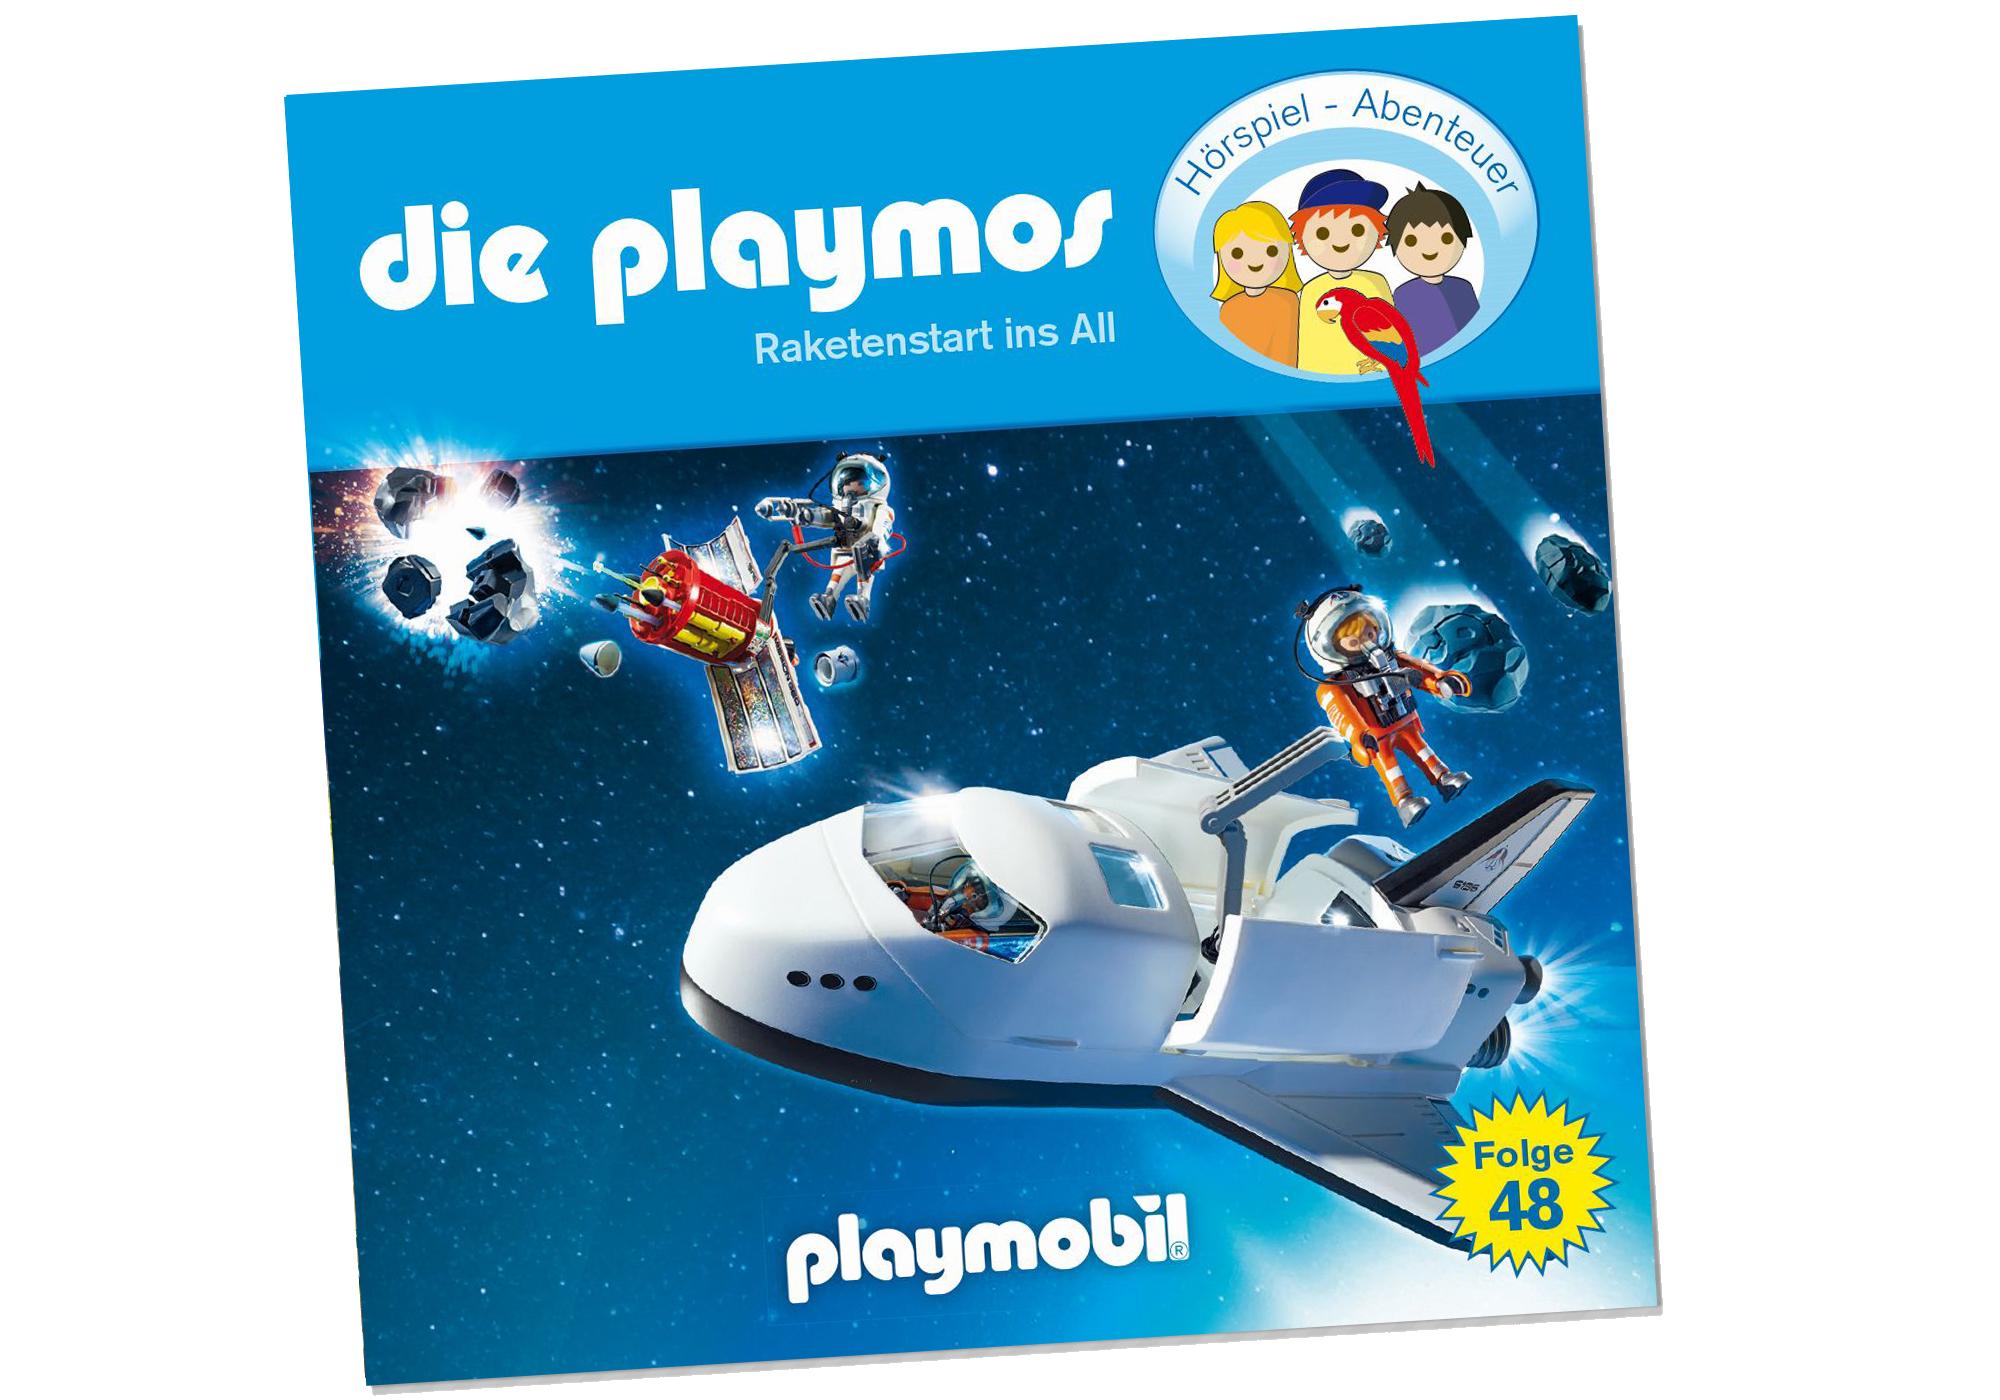 http://media.playmobil.com/i/playmobil/80255_product_detail